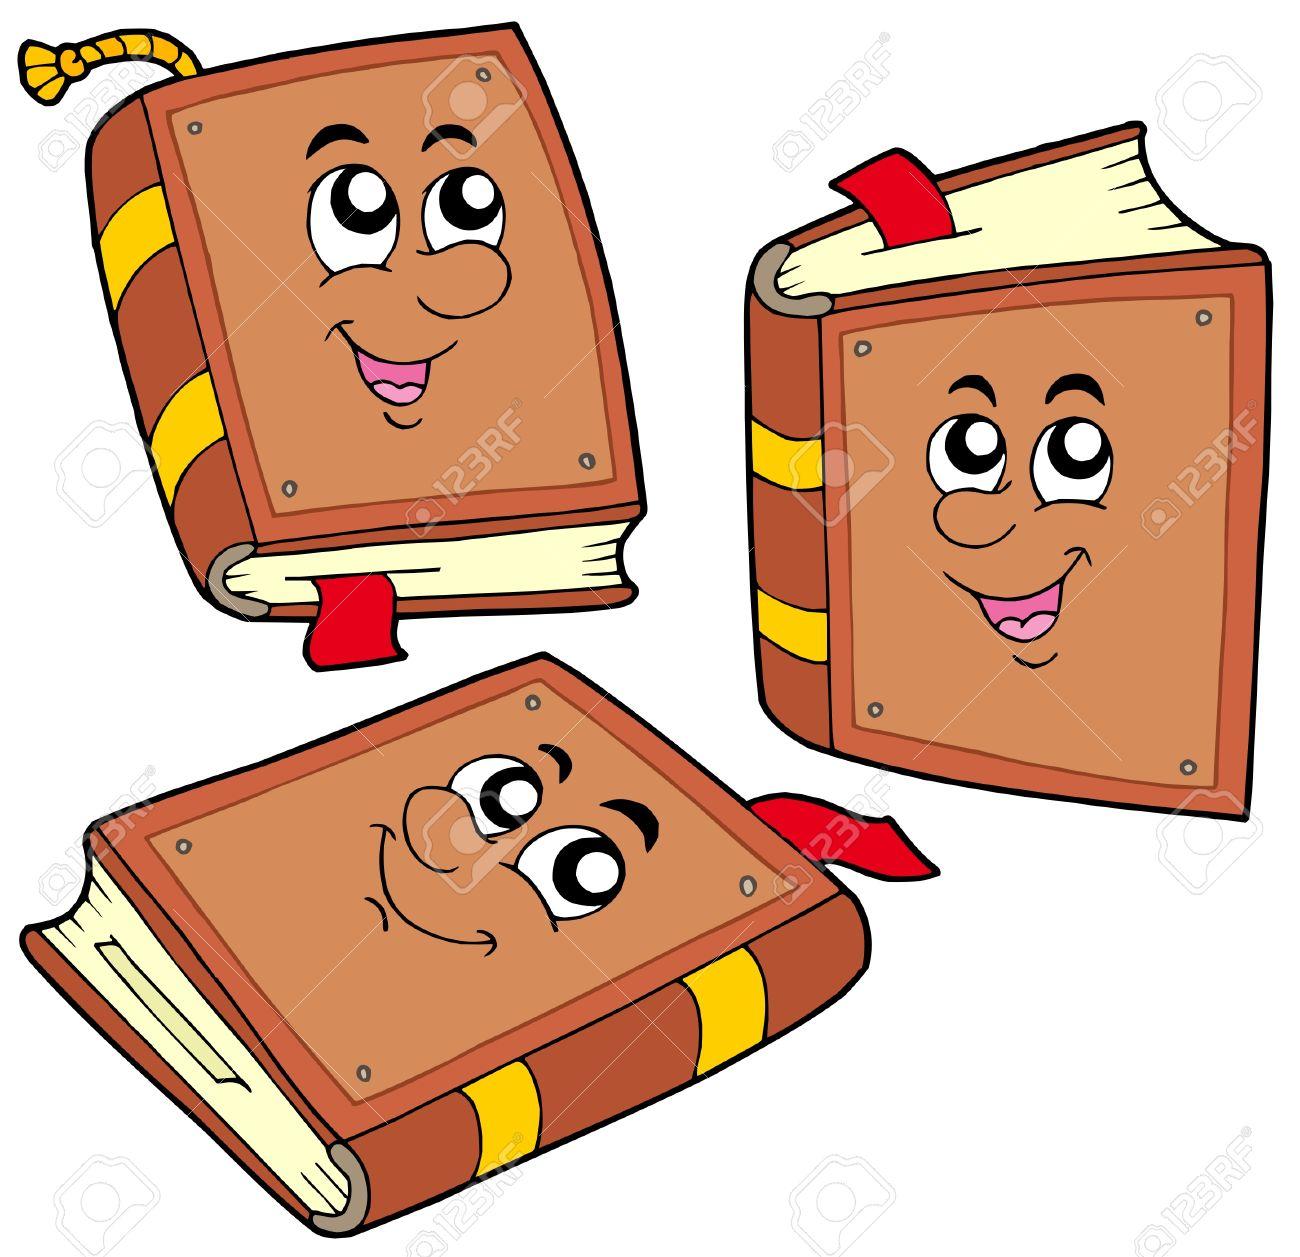 Cartoon books in various positions - vector illustration. Stock Vector - 4874149